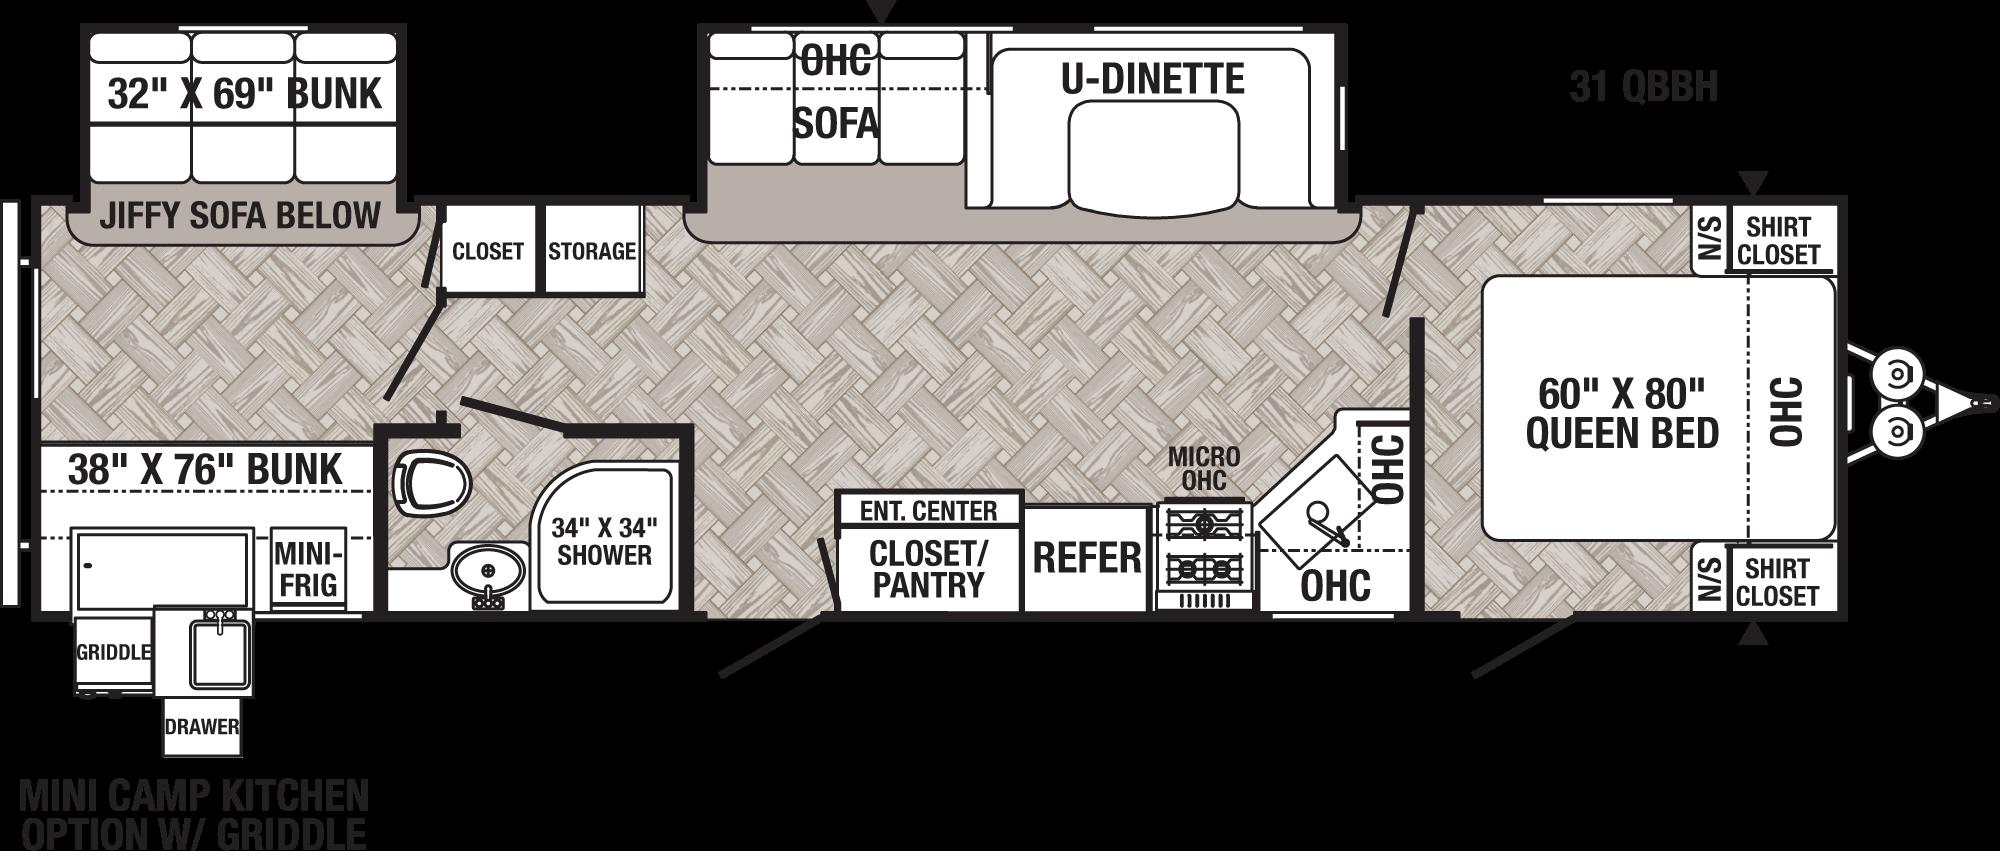 Puma 31qbbh Floorplan